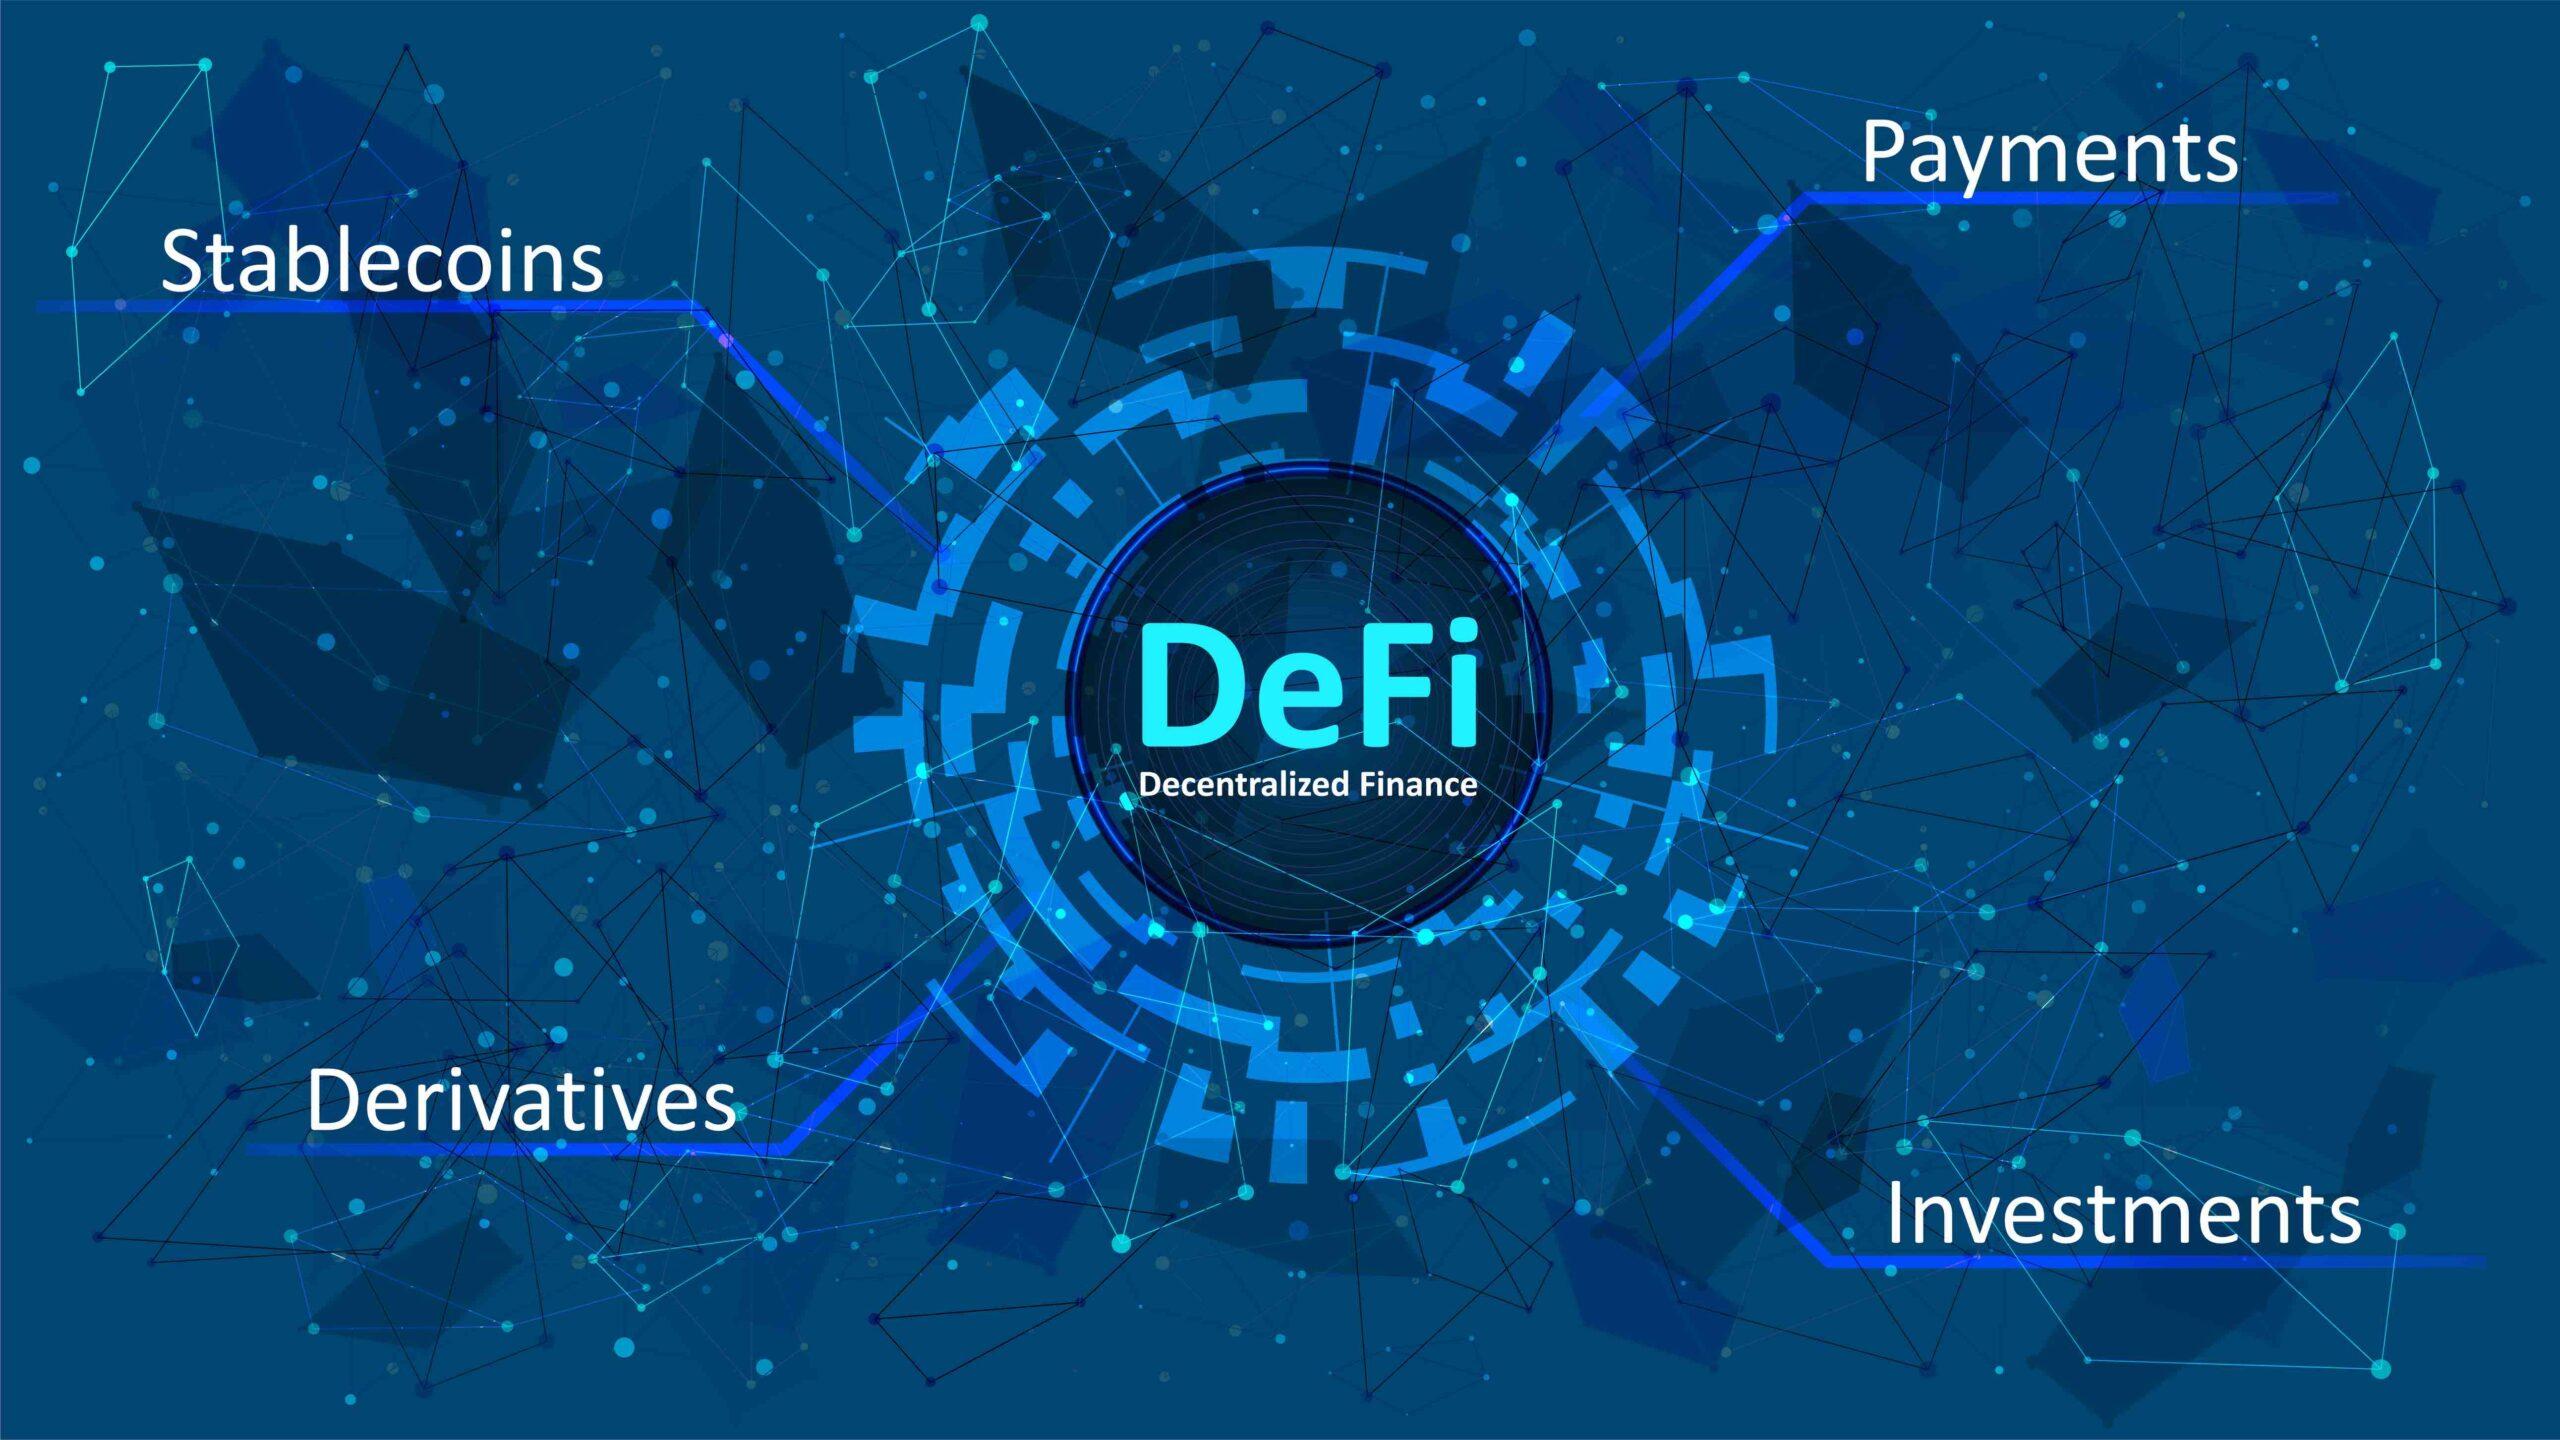 Defi Blockchain